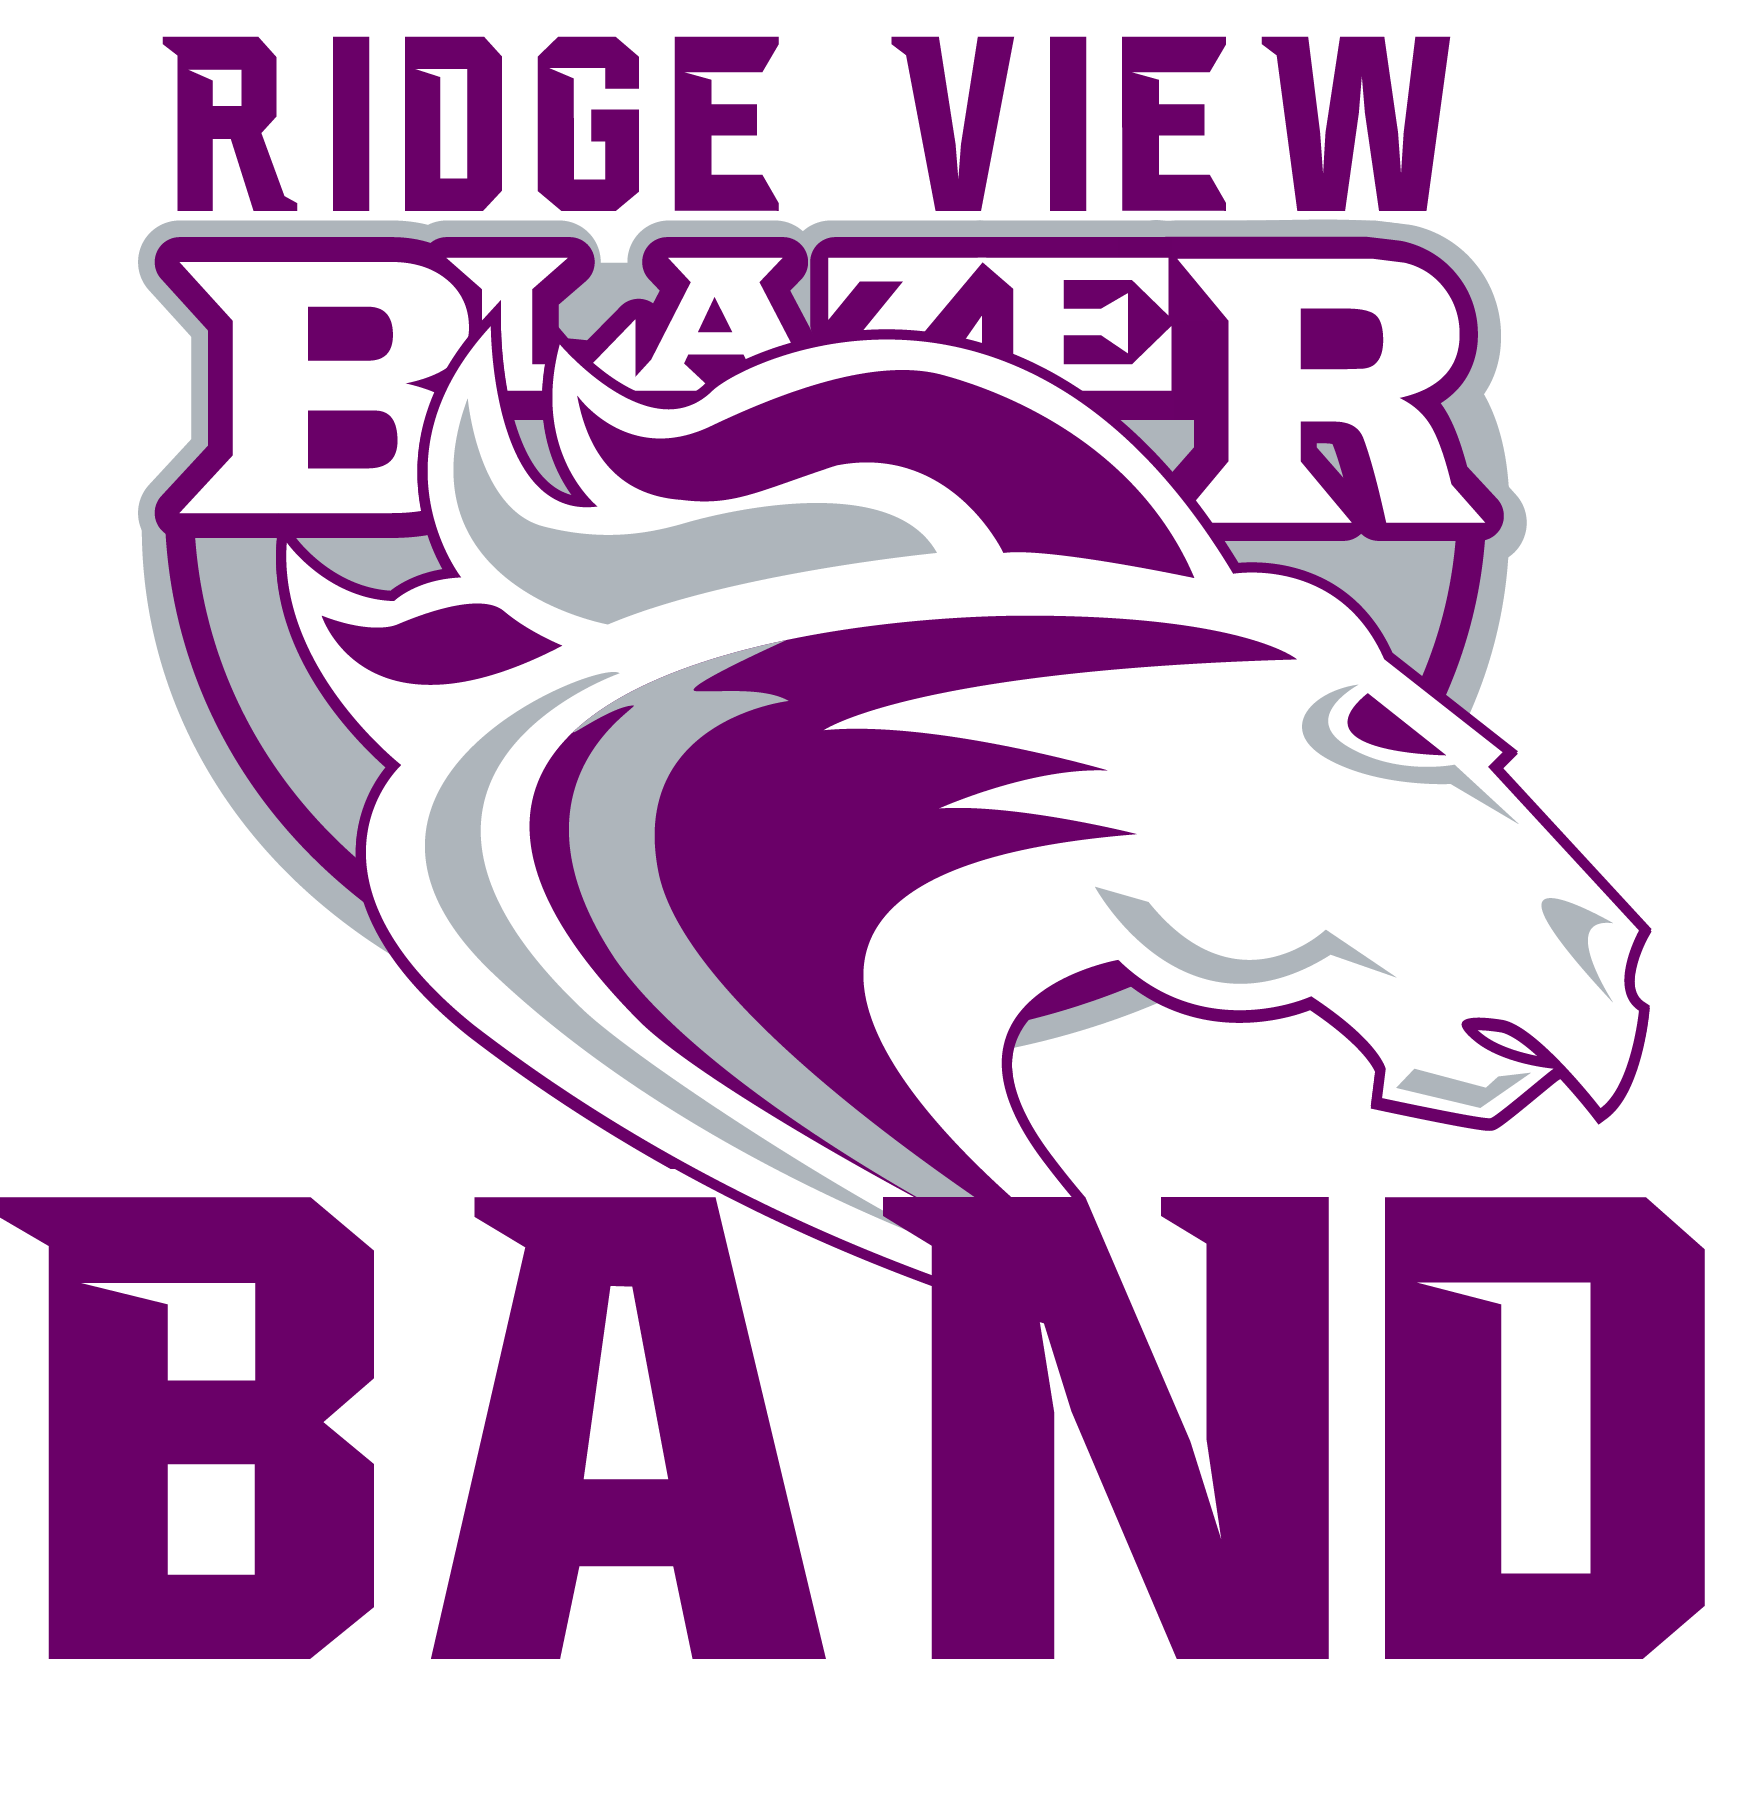 Ridge View High School Band Parent Organization logo